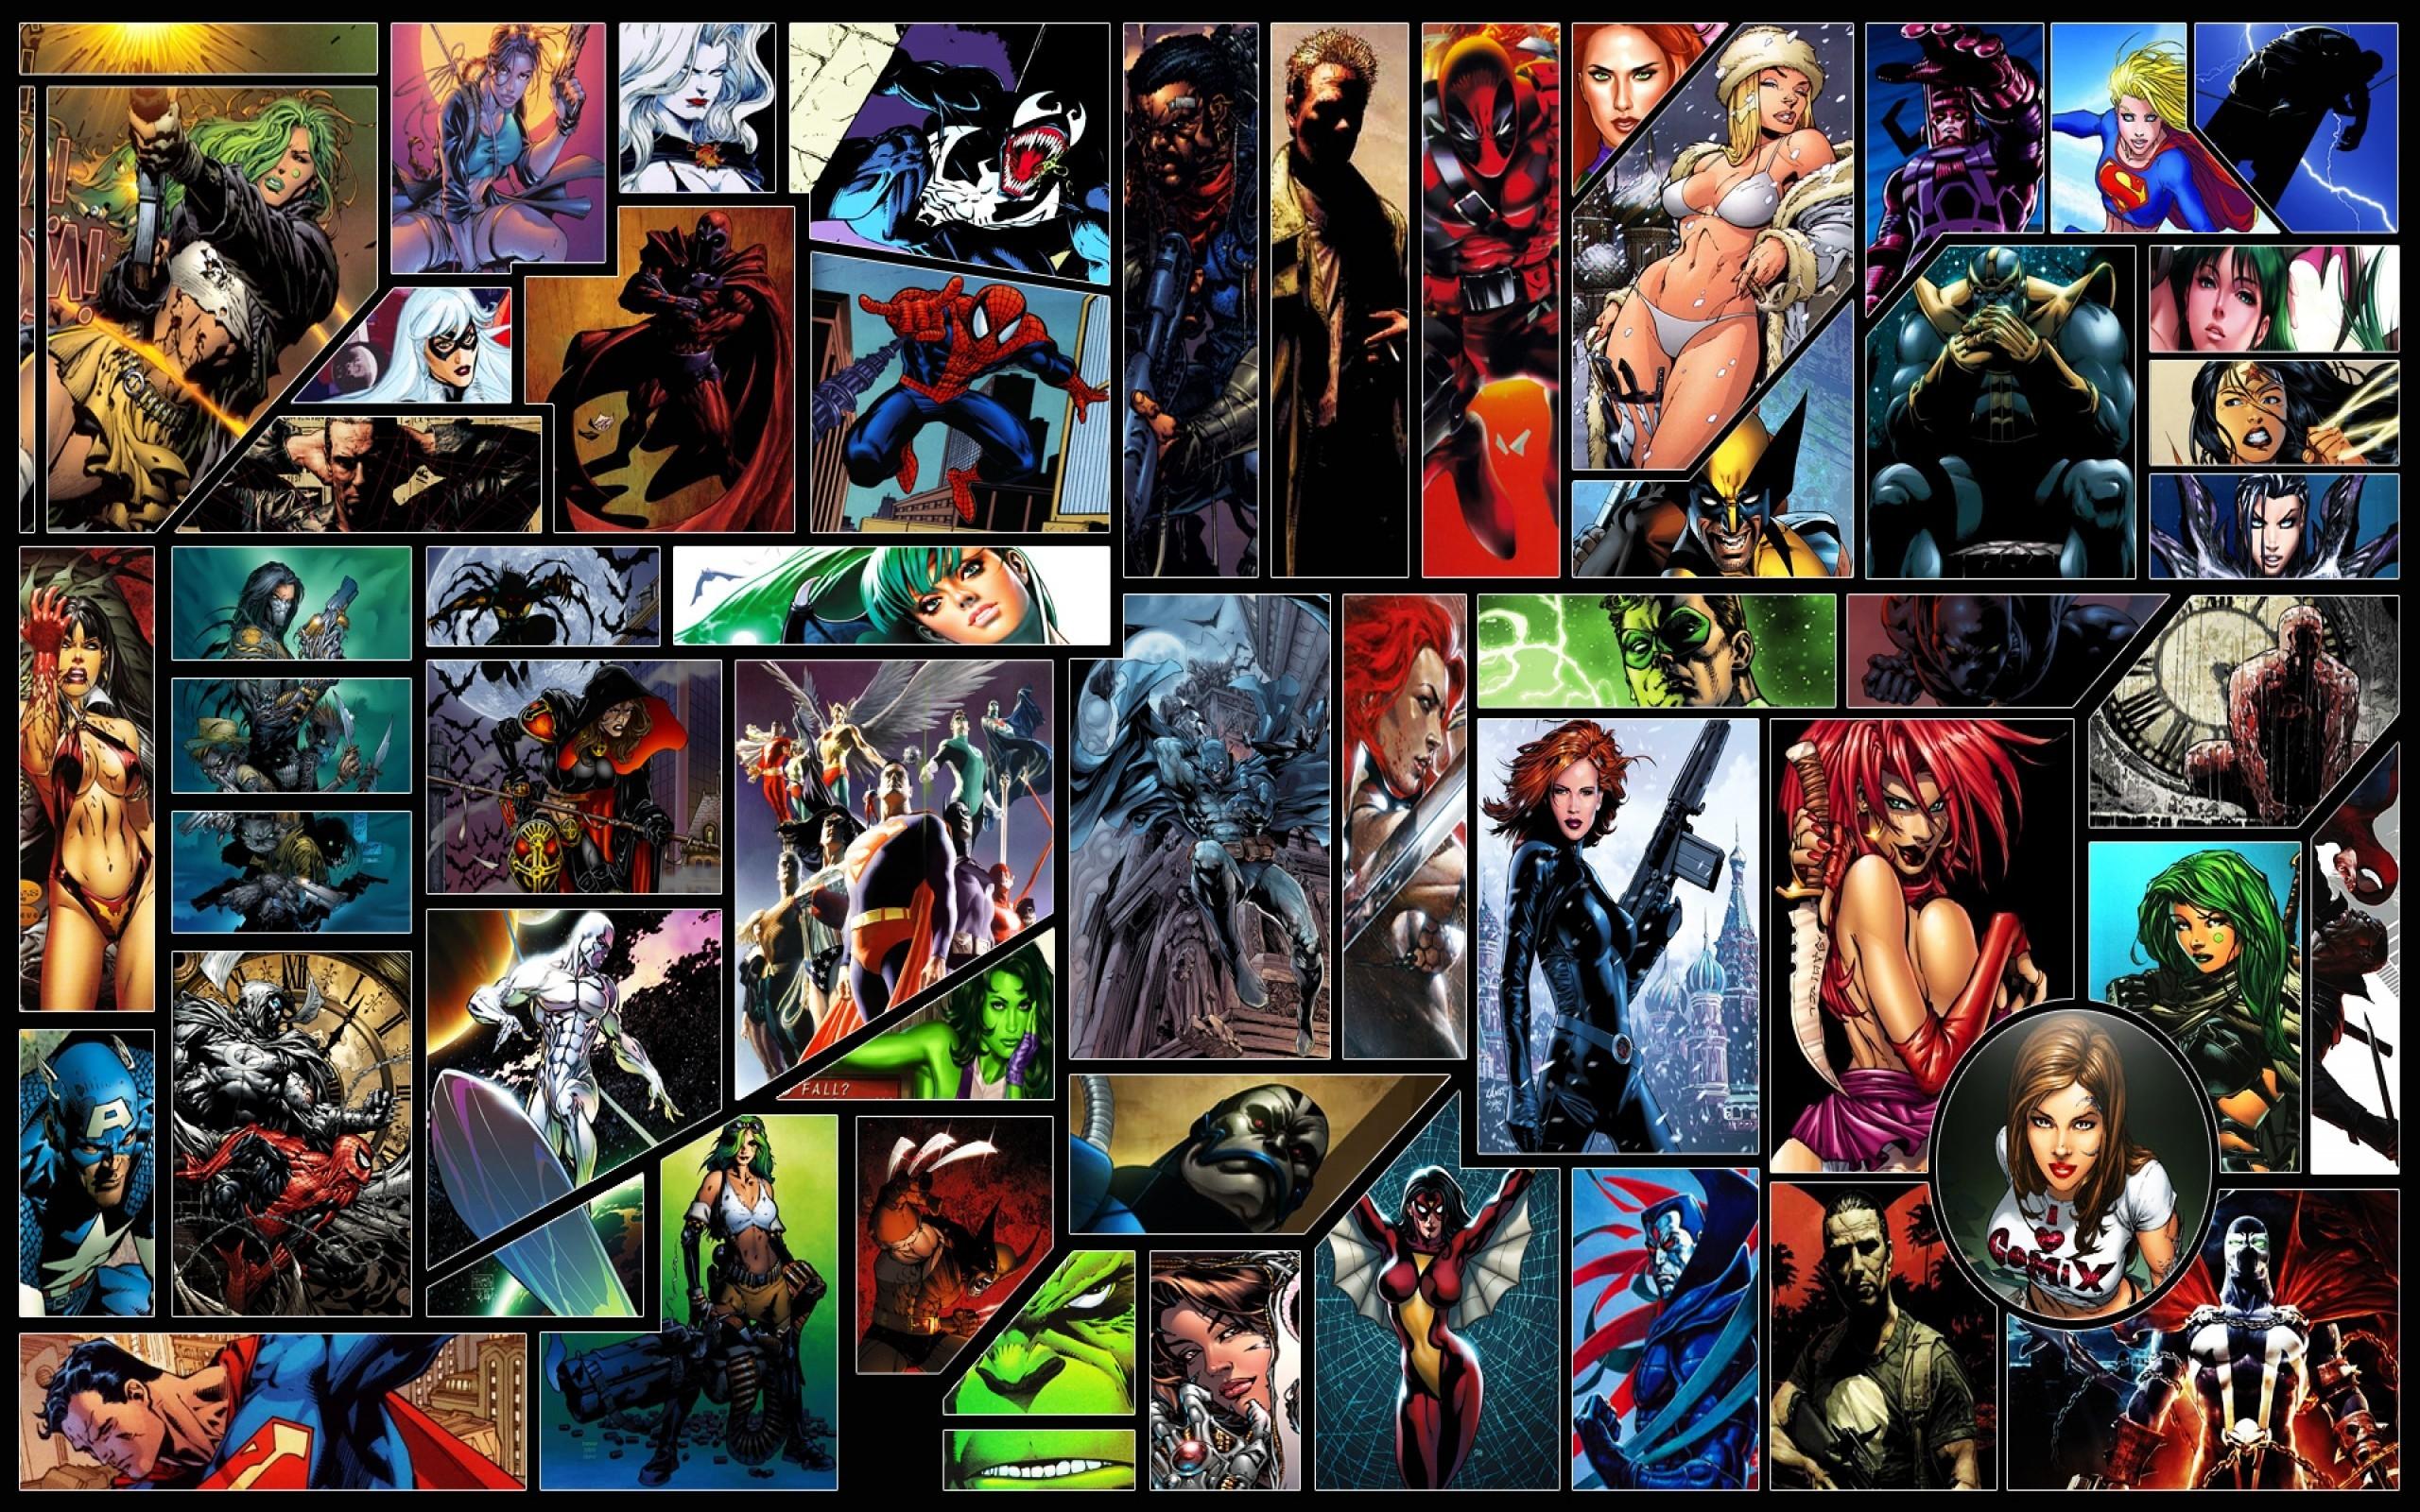 Dc comics superheroes marvel wallpaper background